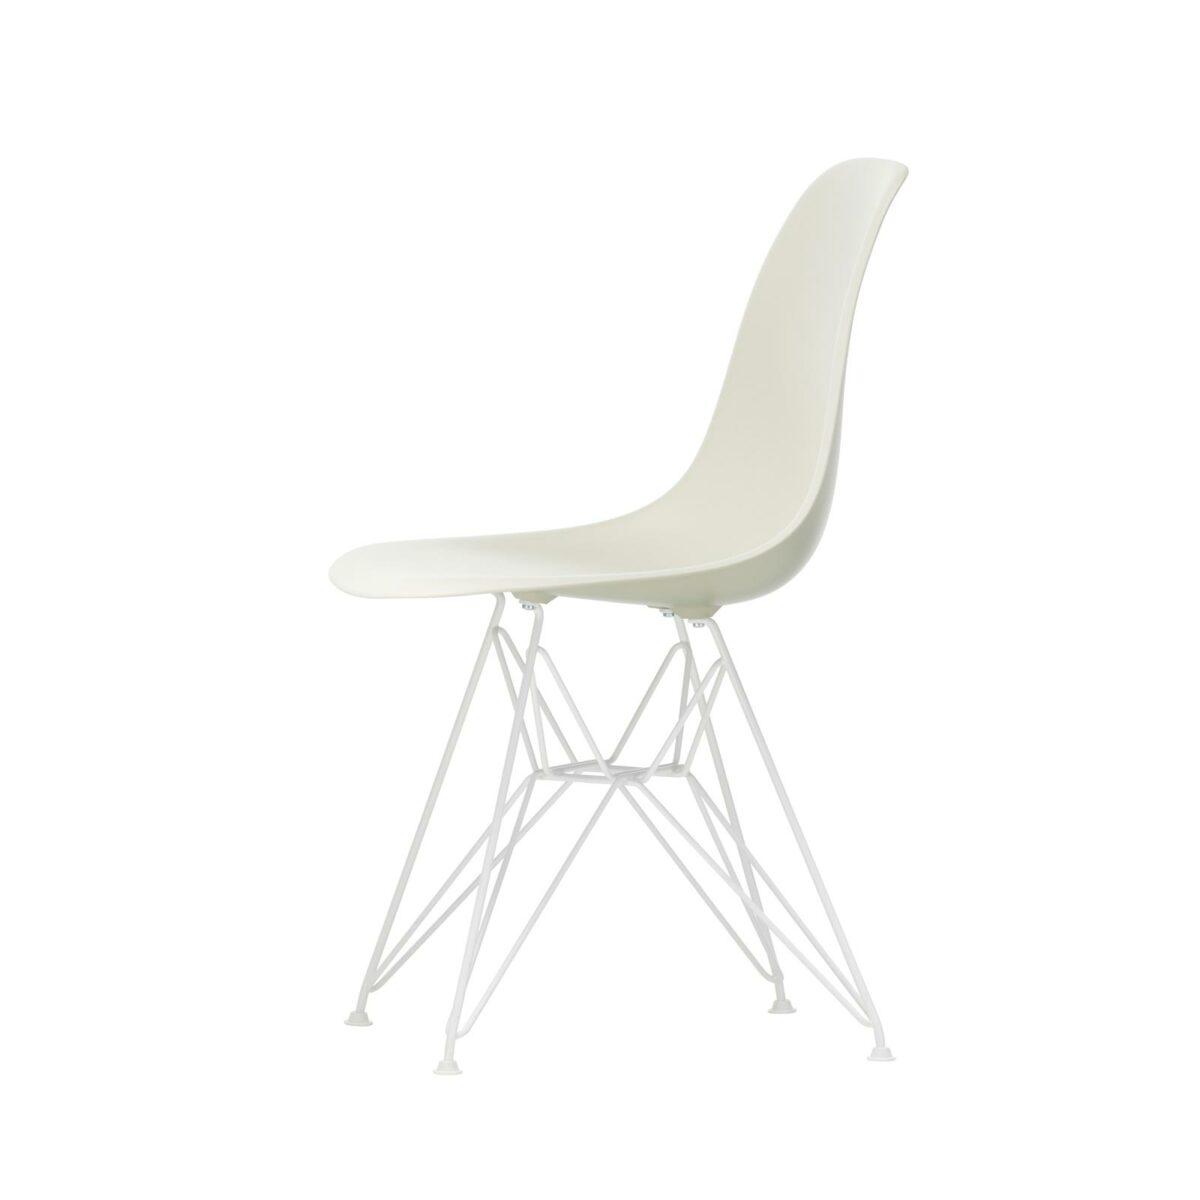 3034940 Eames Plastic Side Chair DSR 11 pebble 04 white powder coated left master